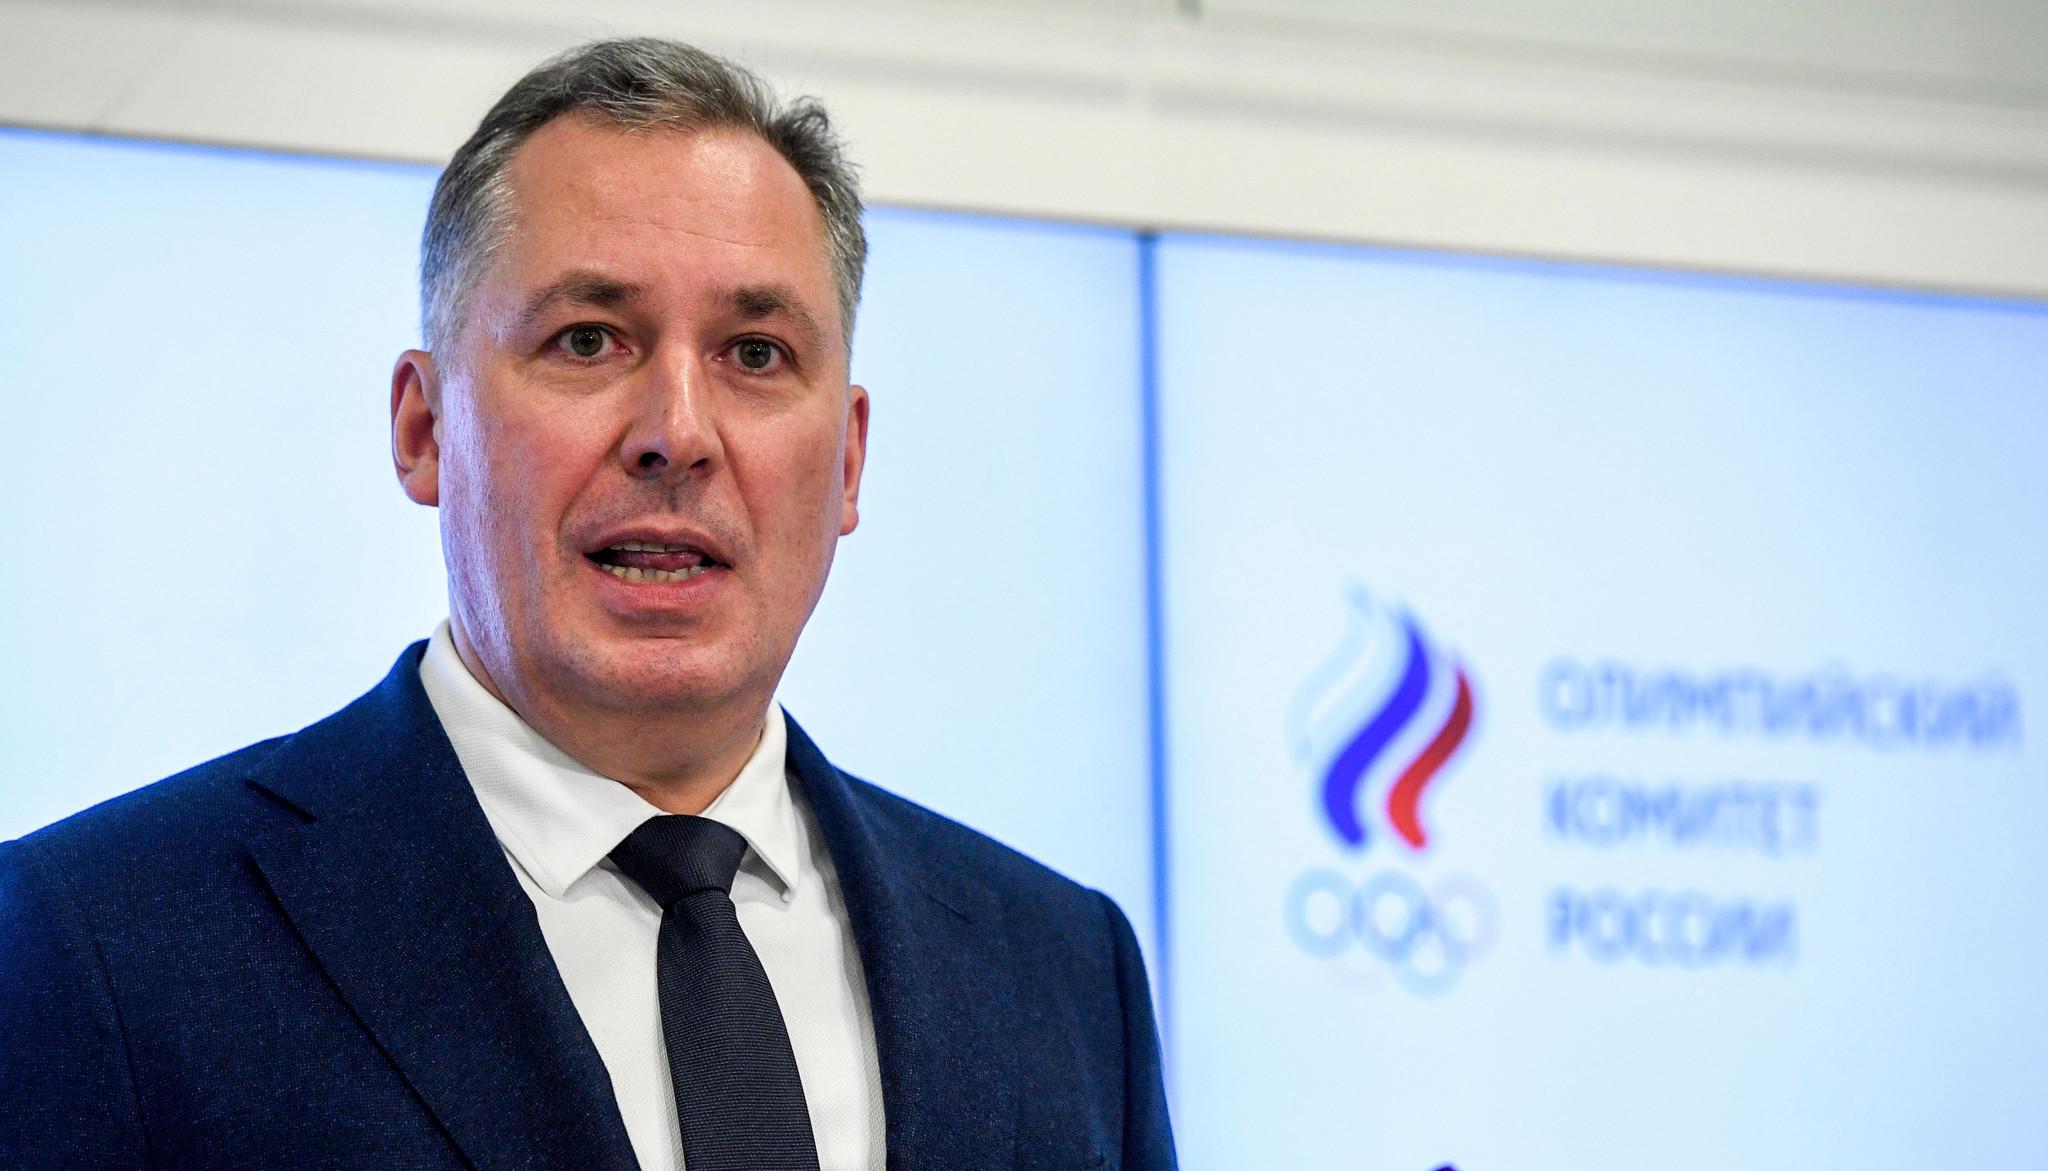 Russian Olympic Committee President Stanislav Pozdnyakov accused RUSADA of financial irregularities ©Getty Images